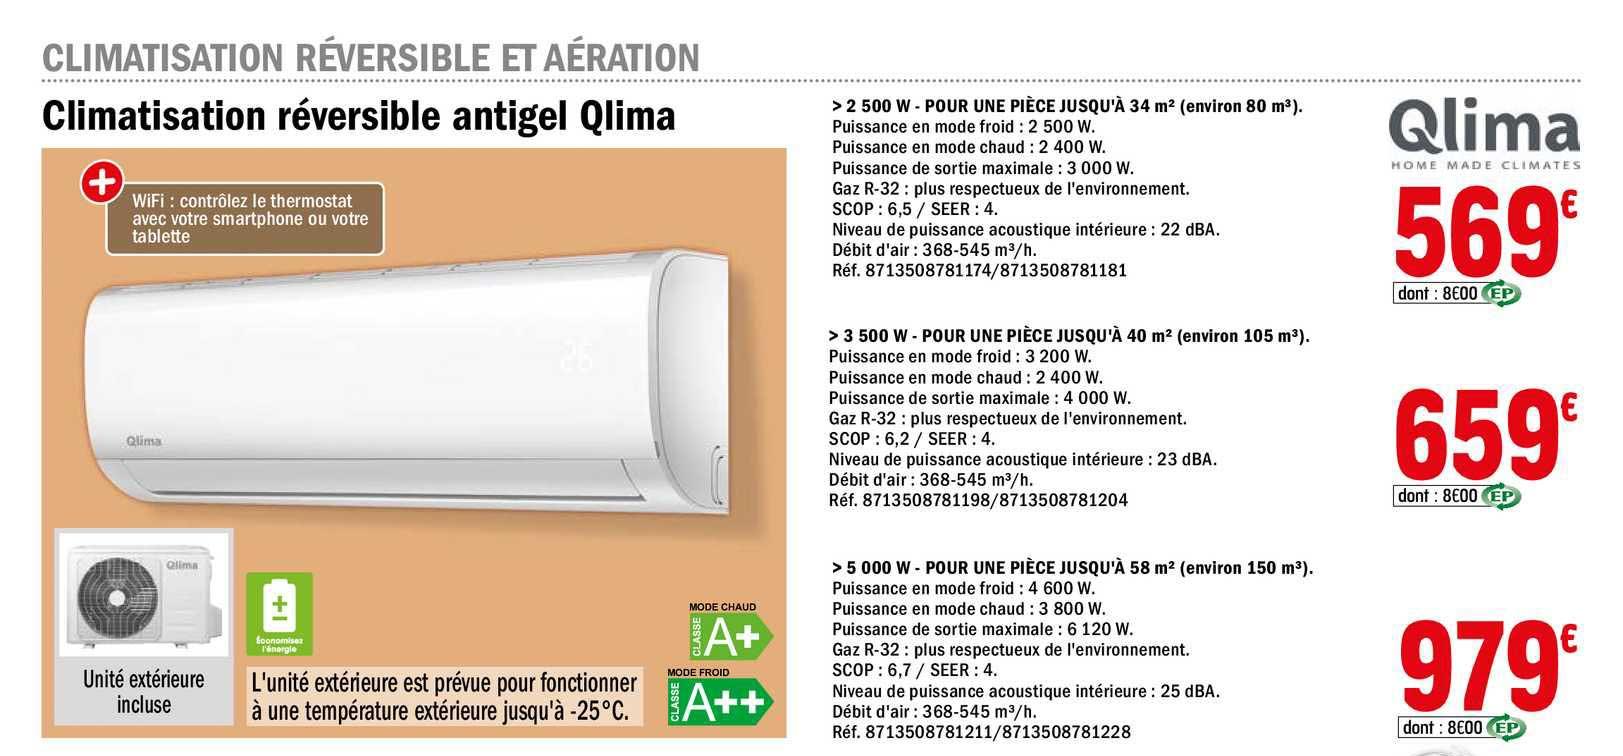 Offre Climatisation Reversible Antigel Qlima Chez Brico Depot